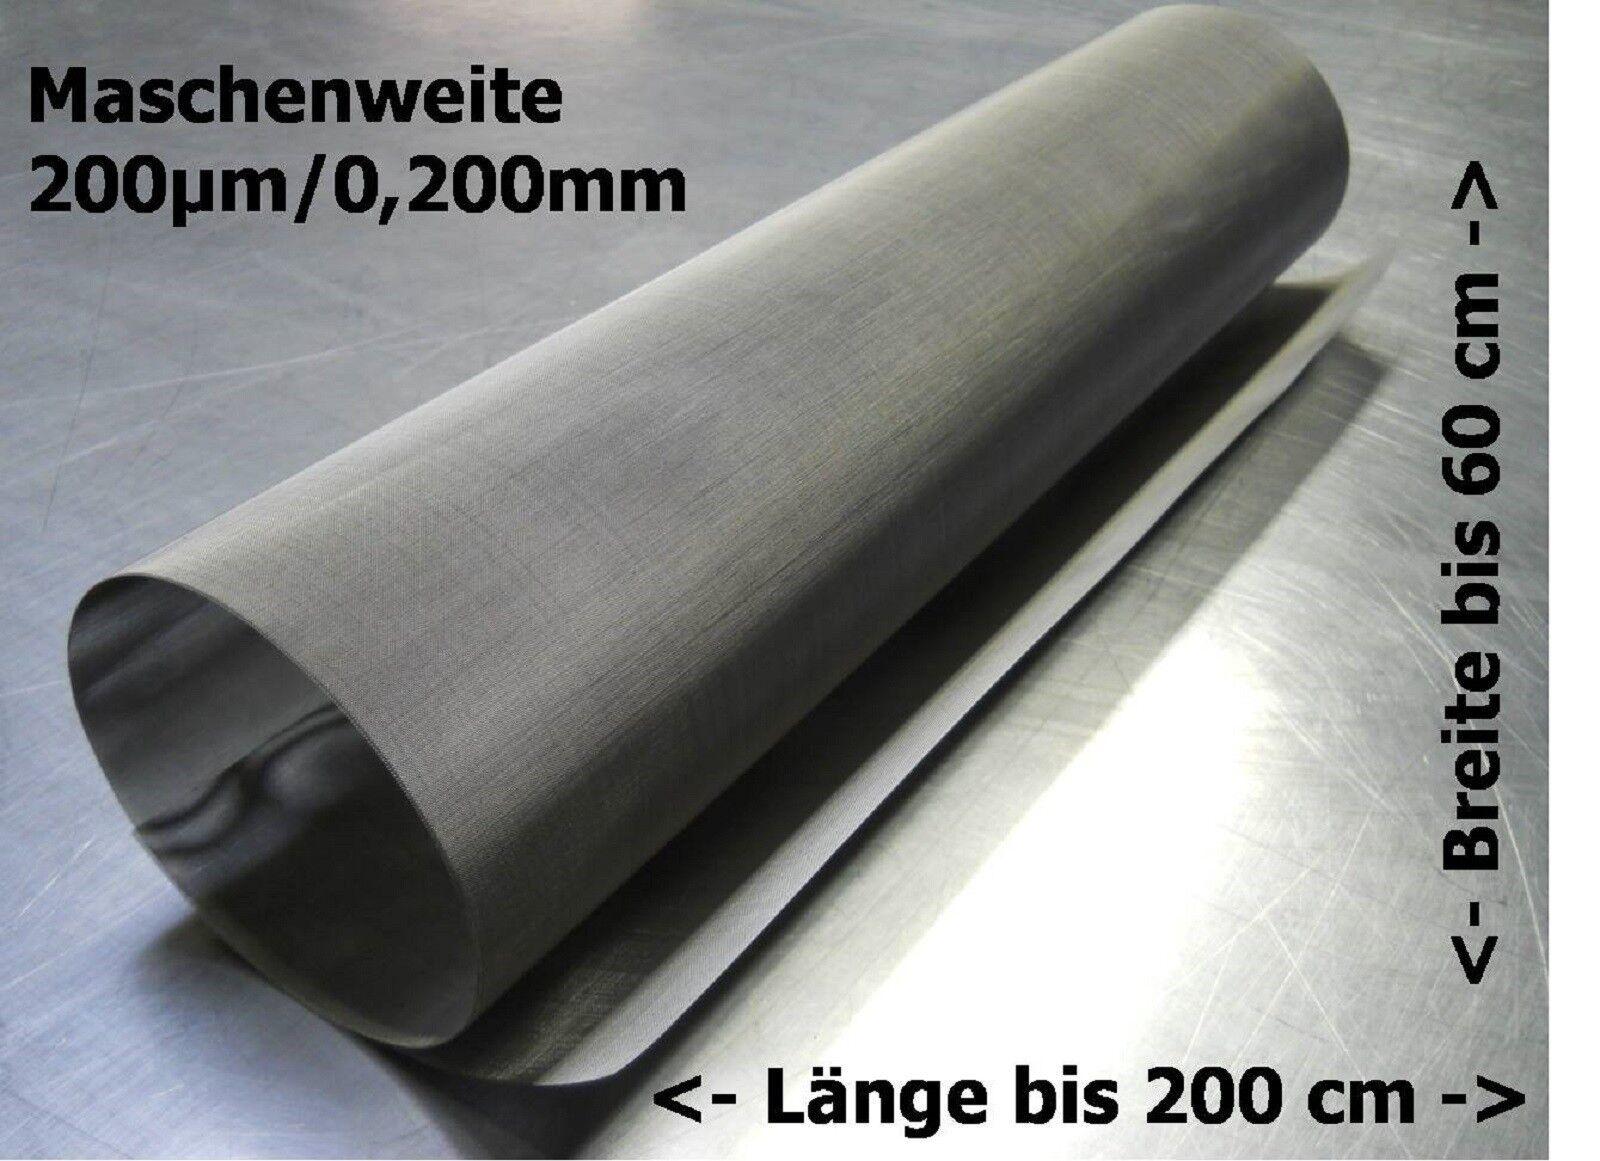 Drahtgewebe Edelstahl Insektenschutz Filter 0,200mm 200µm     bis zu 200x60cm